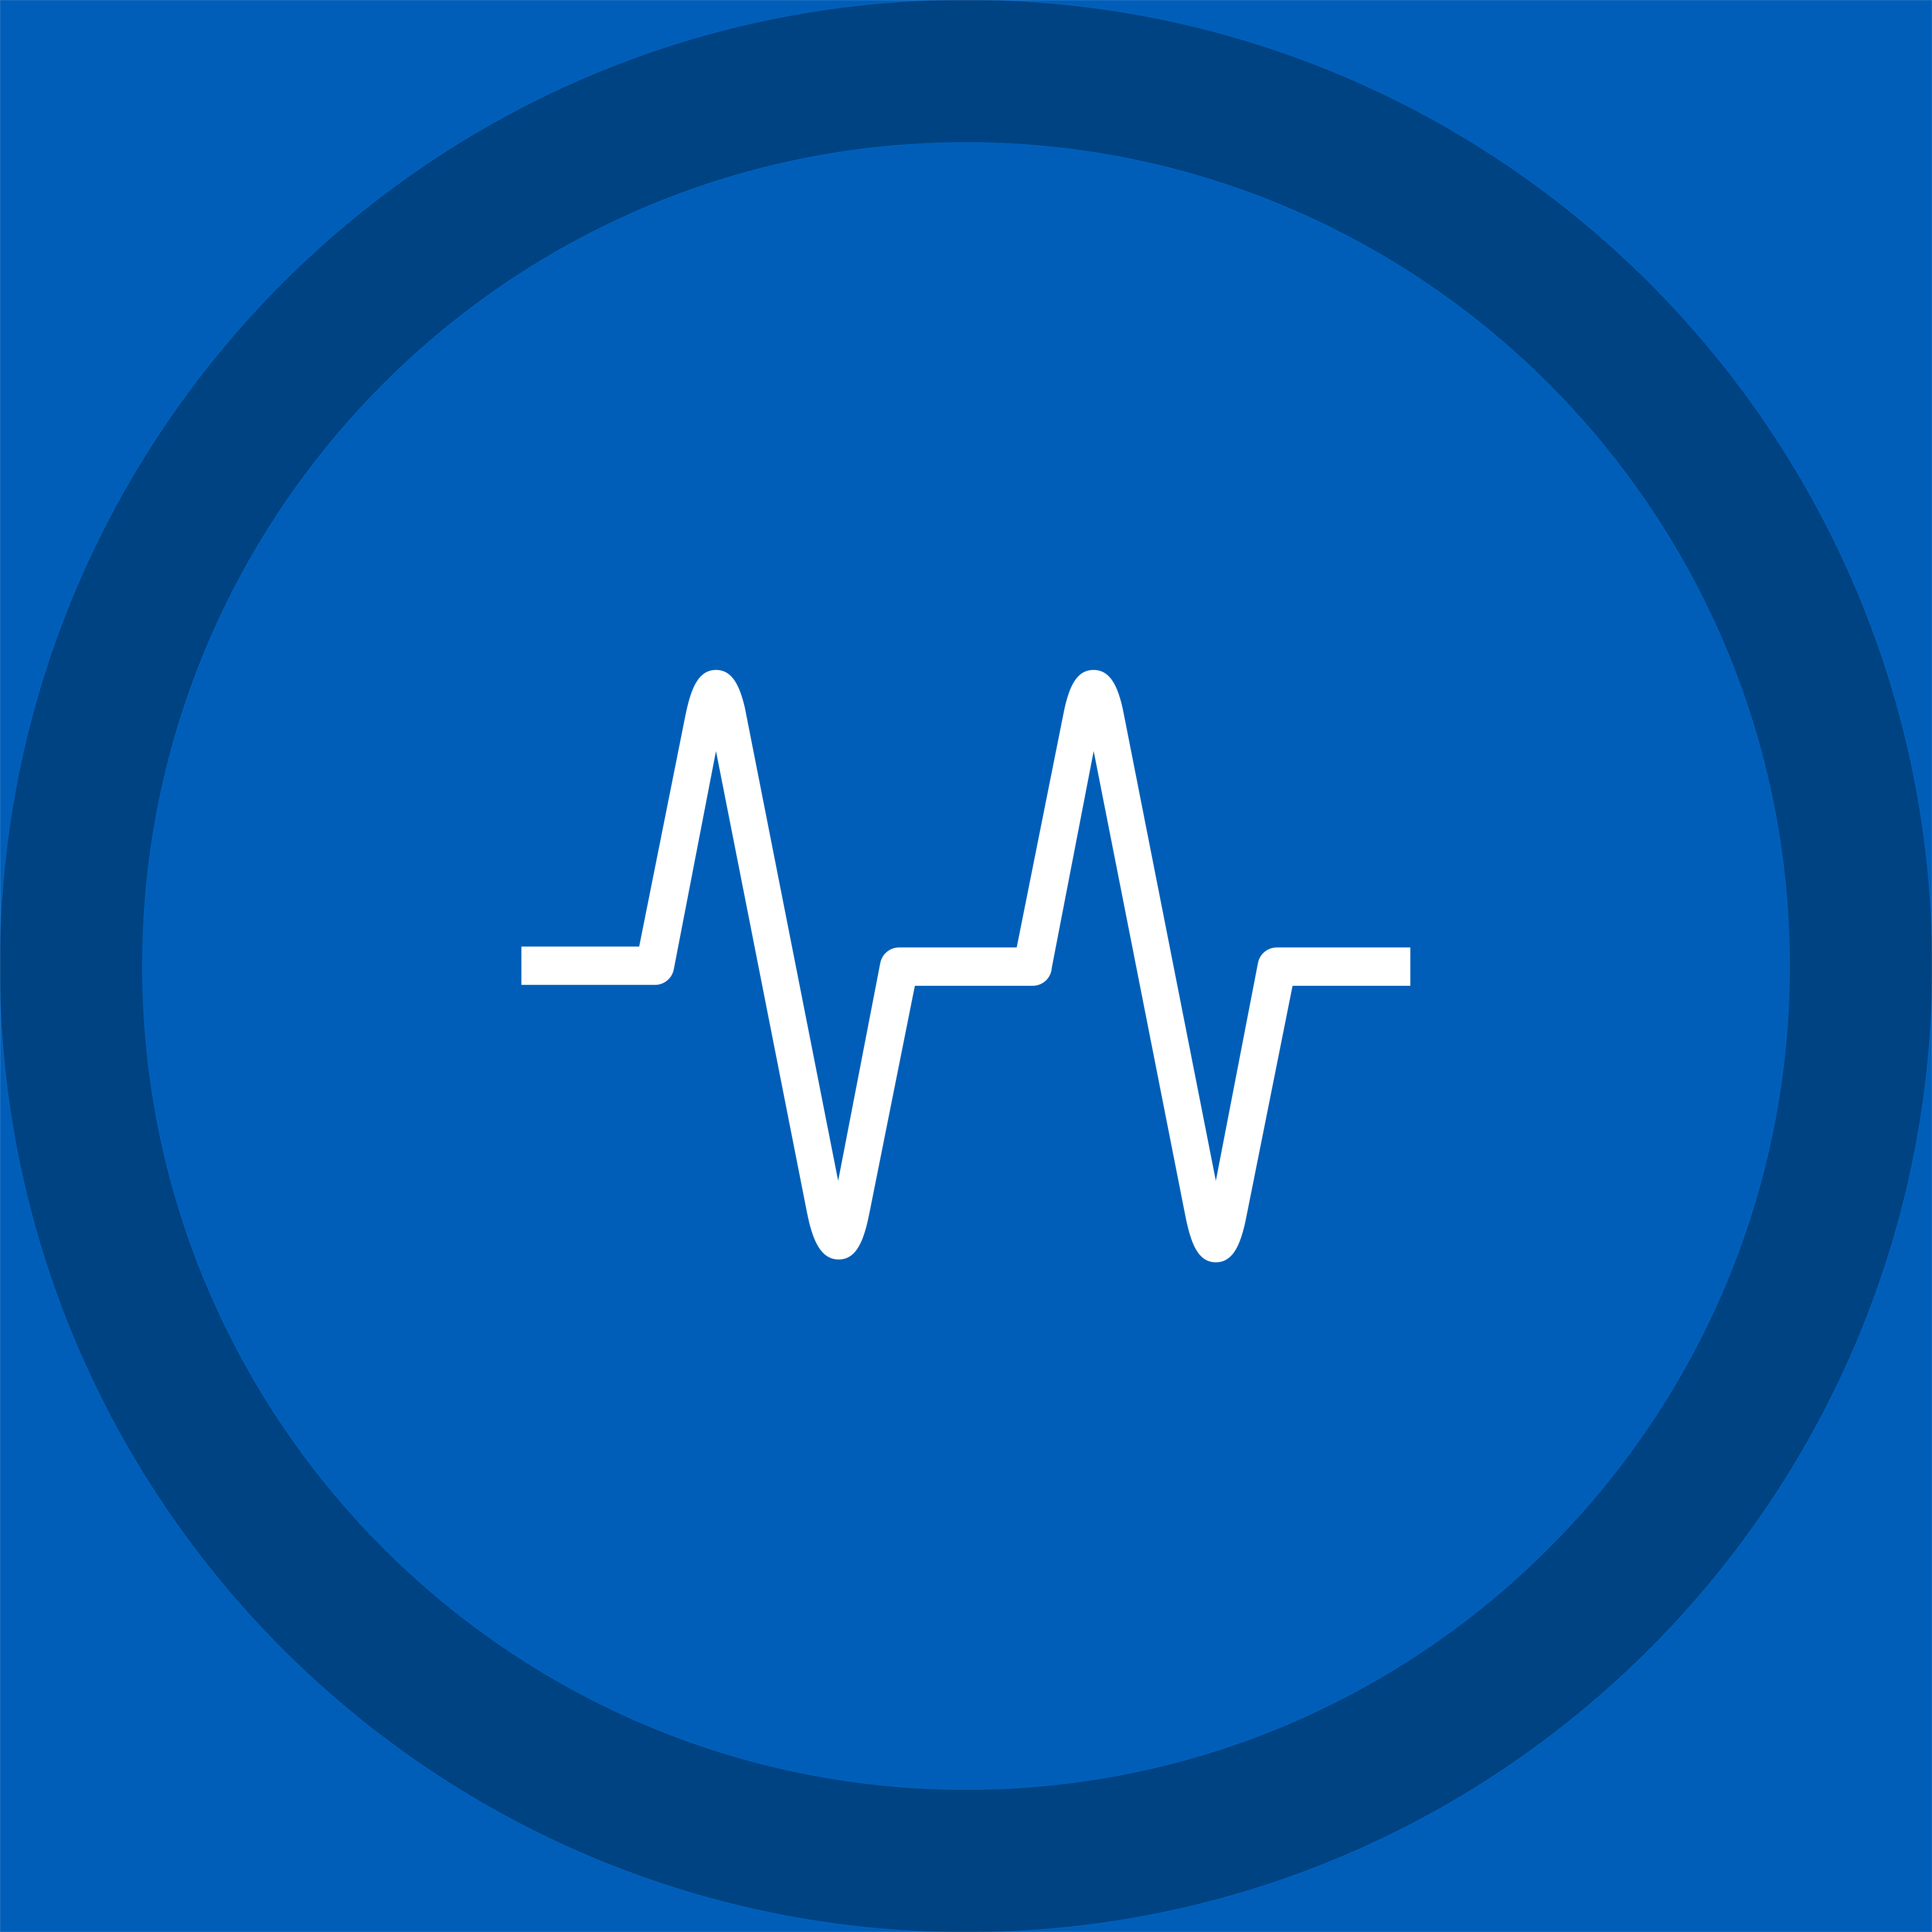 Elektrokardiogramme